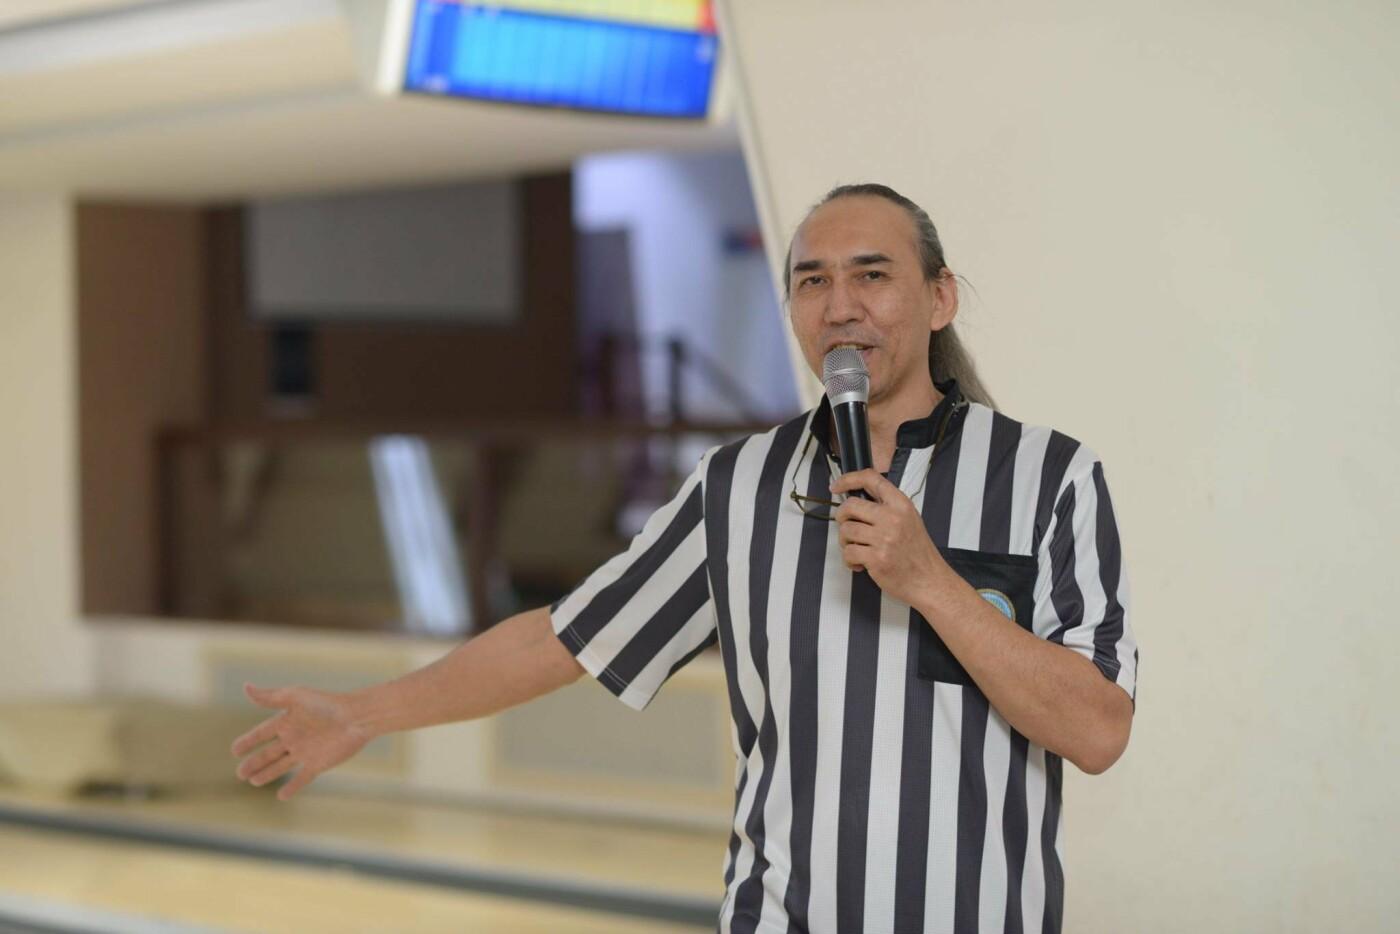 II турнир по боулингу среди журналистов прошел в Алматы (ФОТО), фото-1